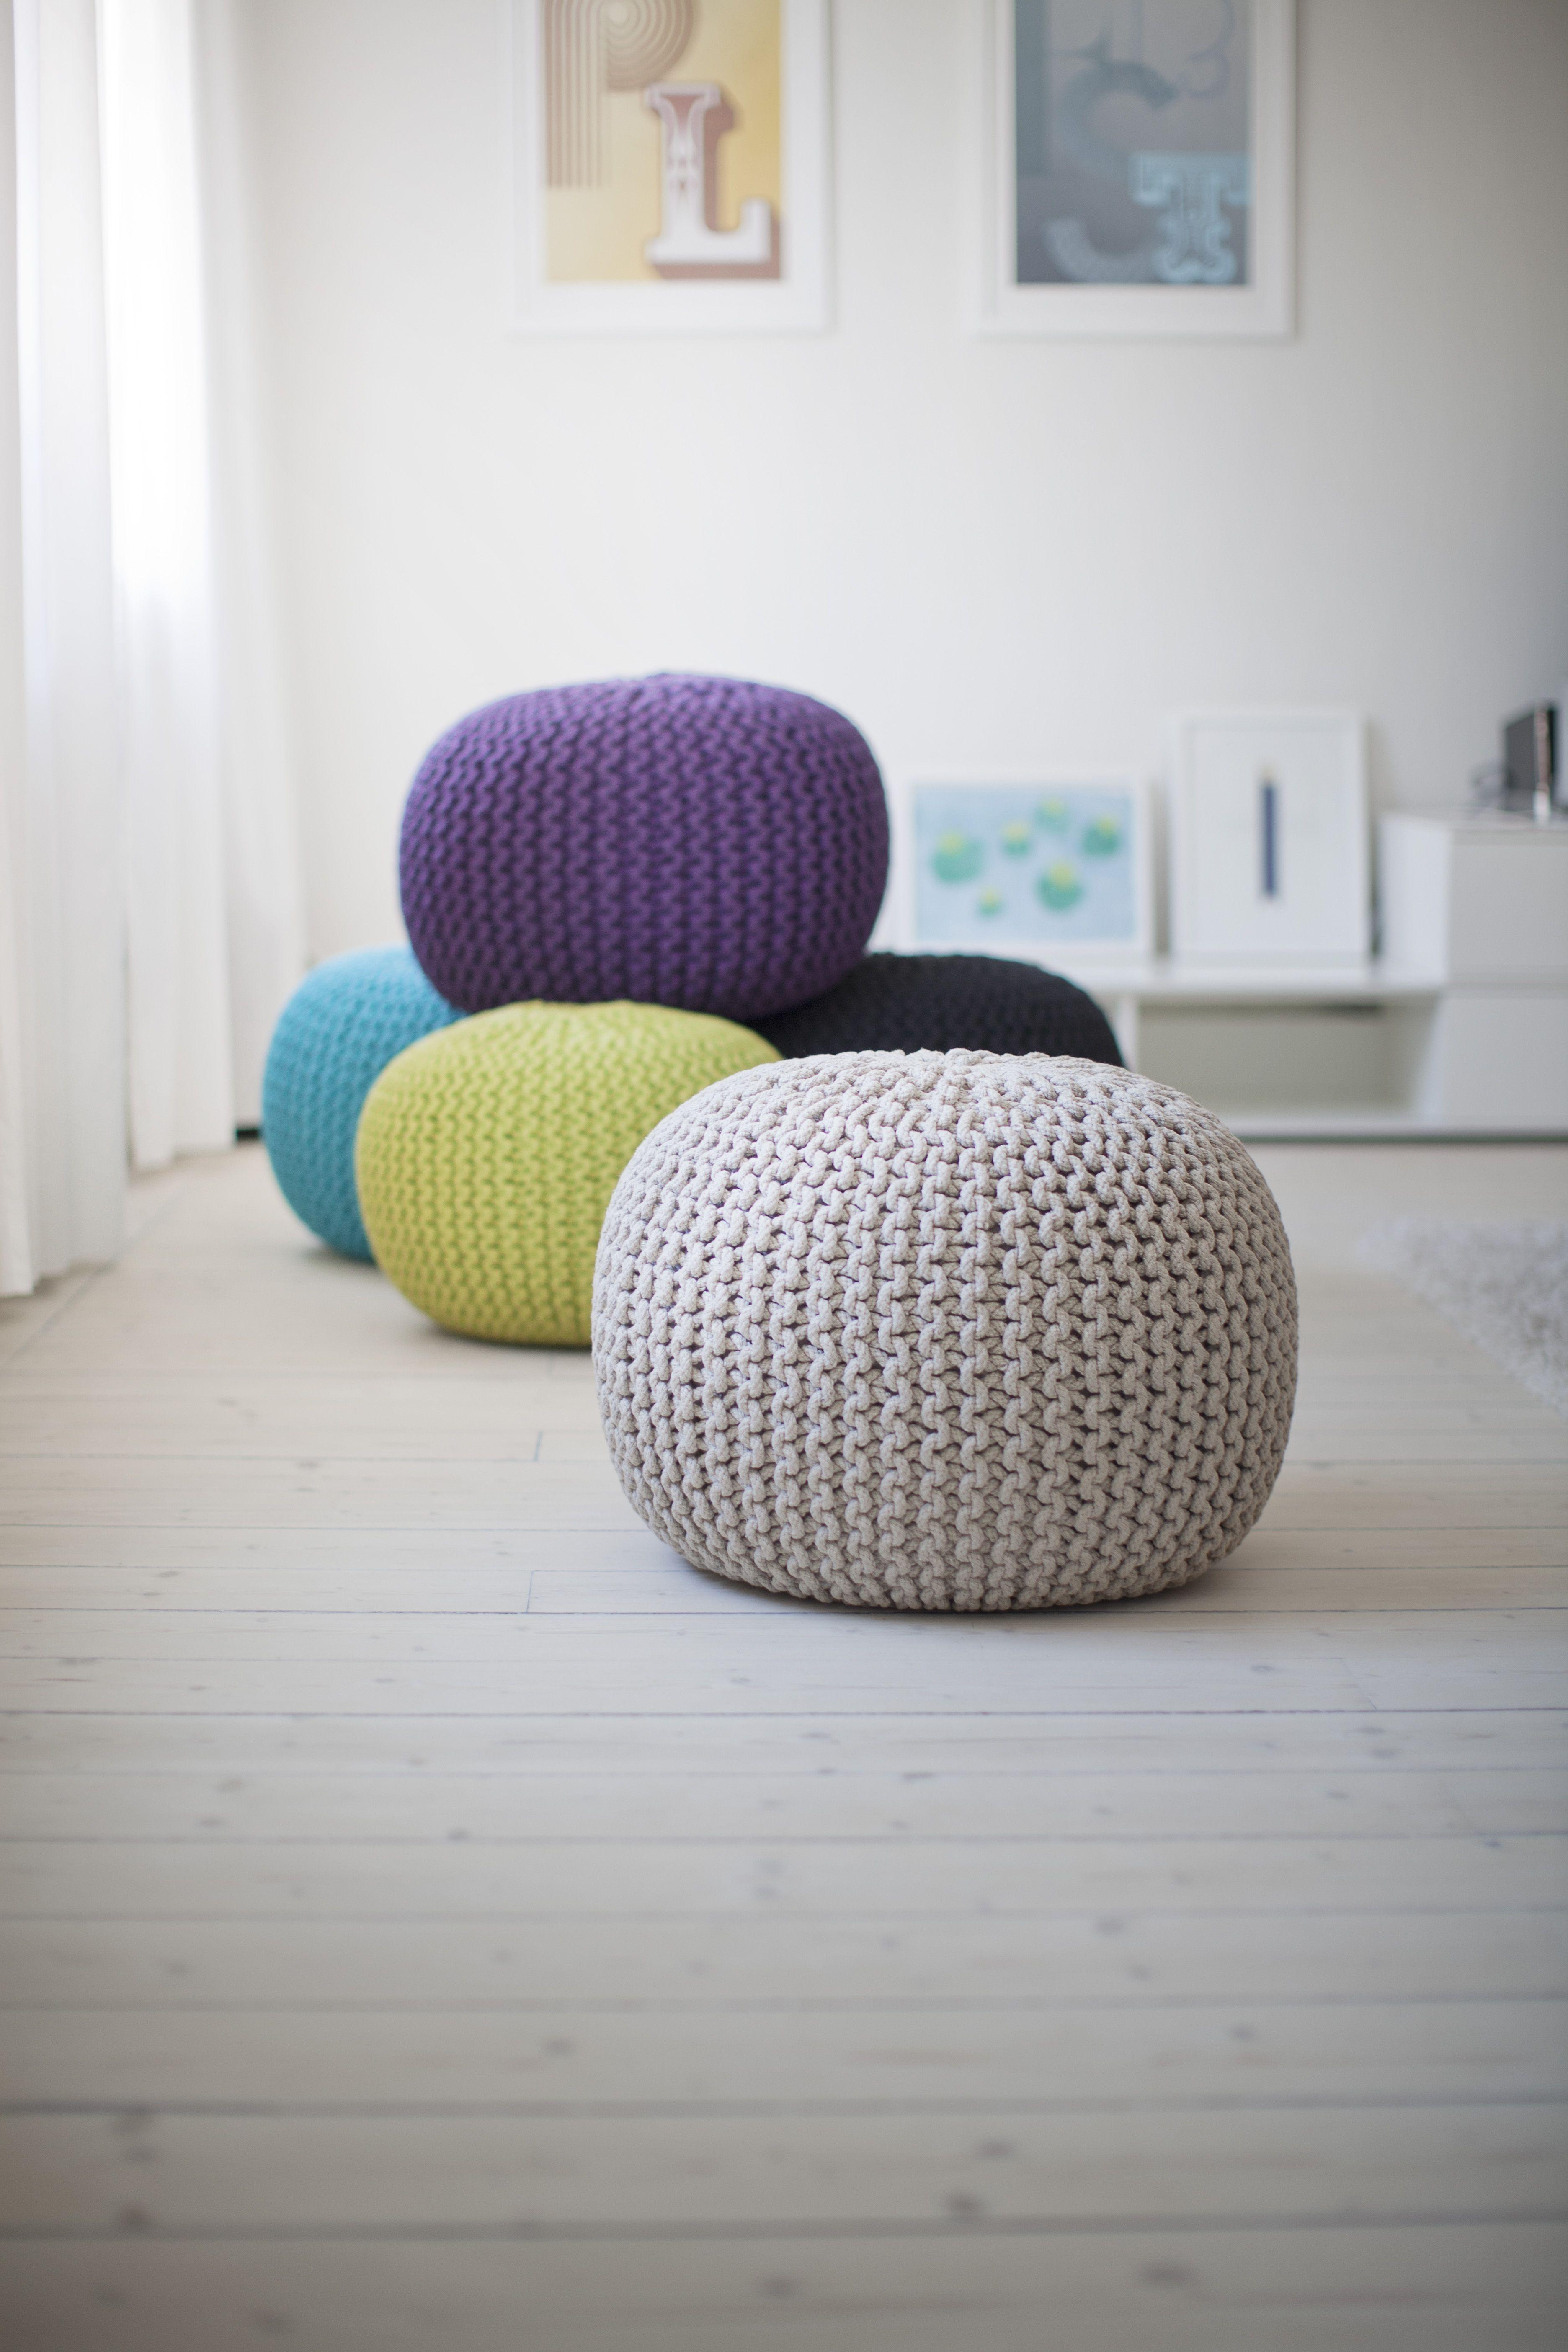 Lob Design Pouf.Knitted Pouffs From Lob Design Www Lobdesign Se Herseyden